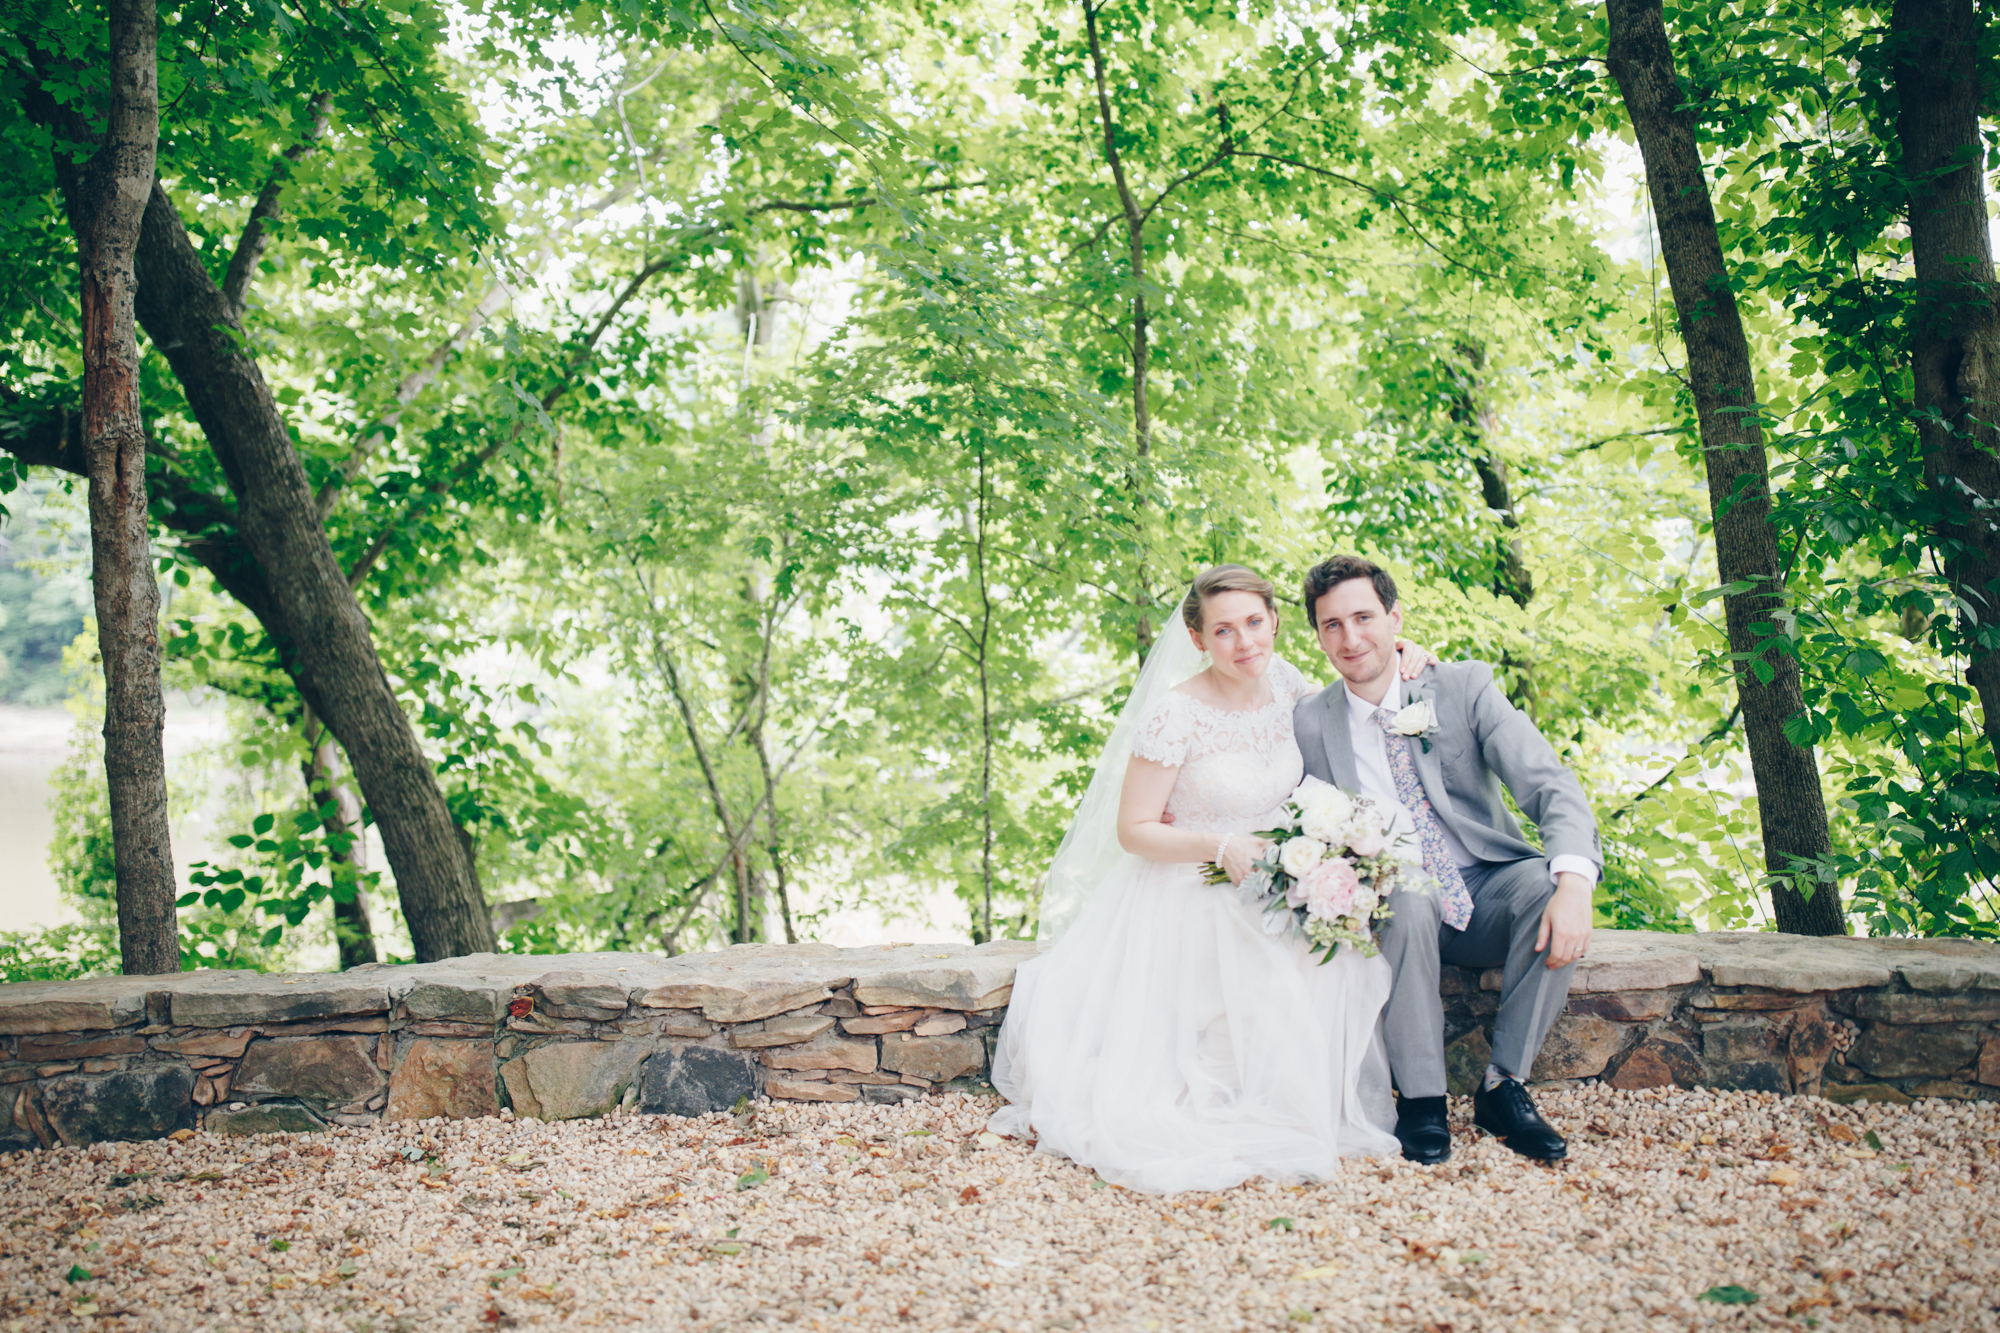 Aileen & Max | DC & Virginia Wedding Photographer | Maral Noori Photography | Haw River Ballroom